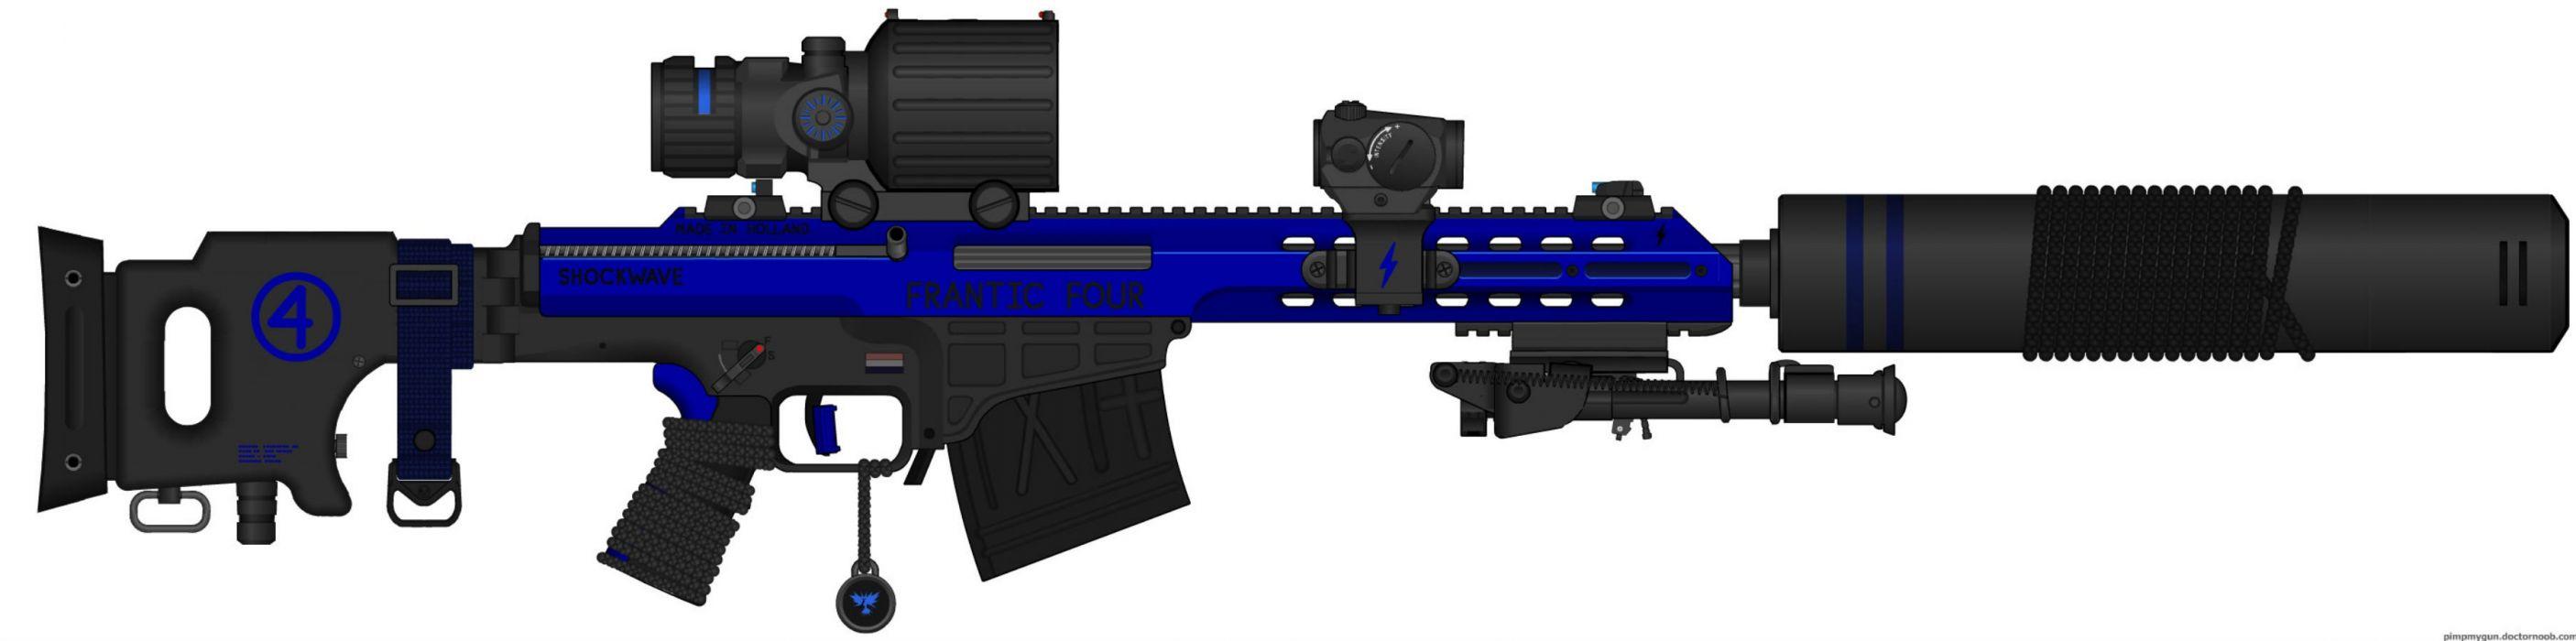 SUPER MONDAY NIGHT COMBAT mmo shooter game mnc (11) wallpaper